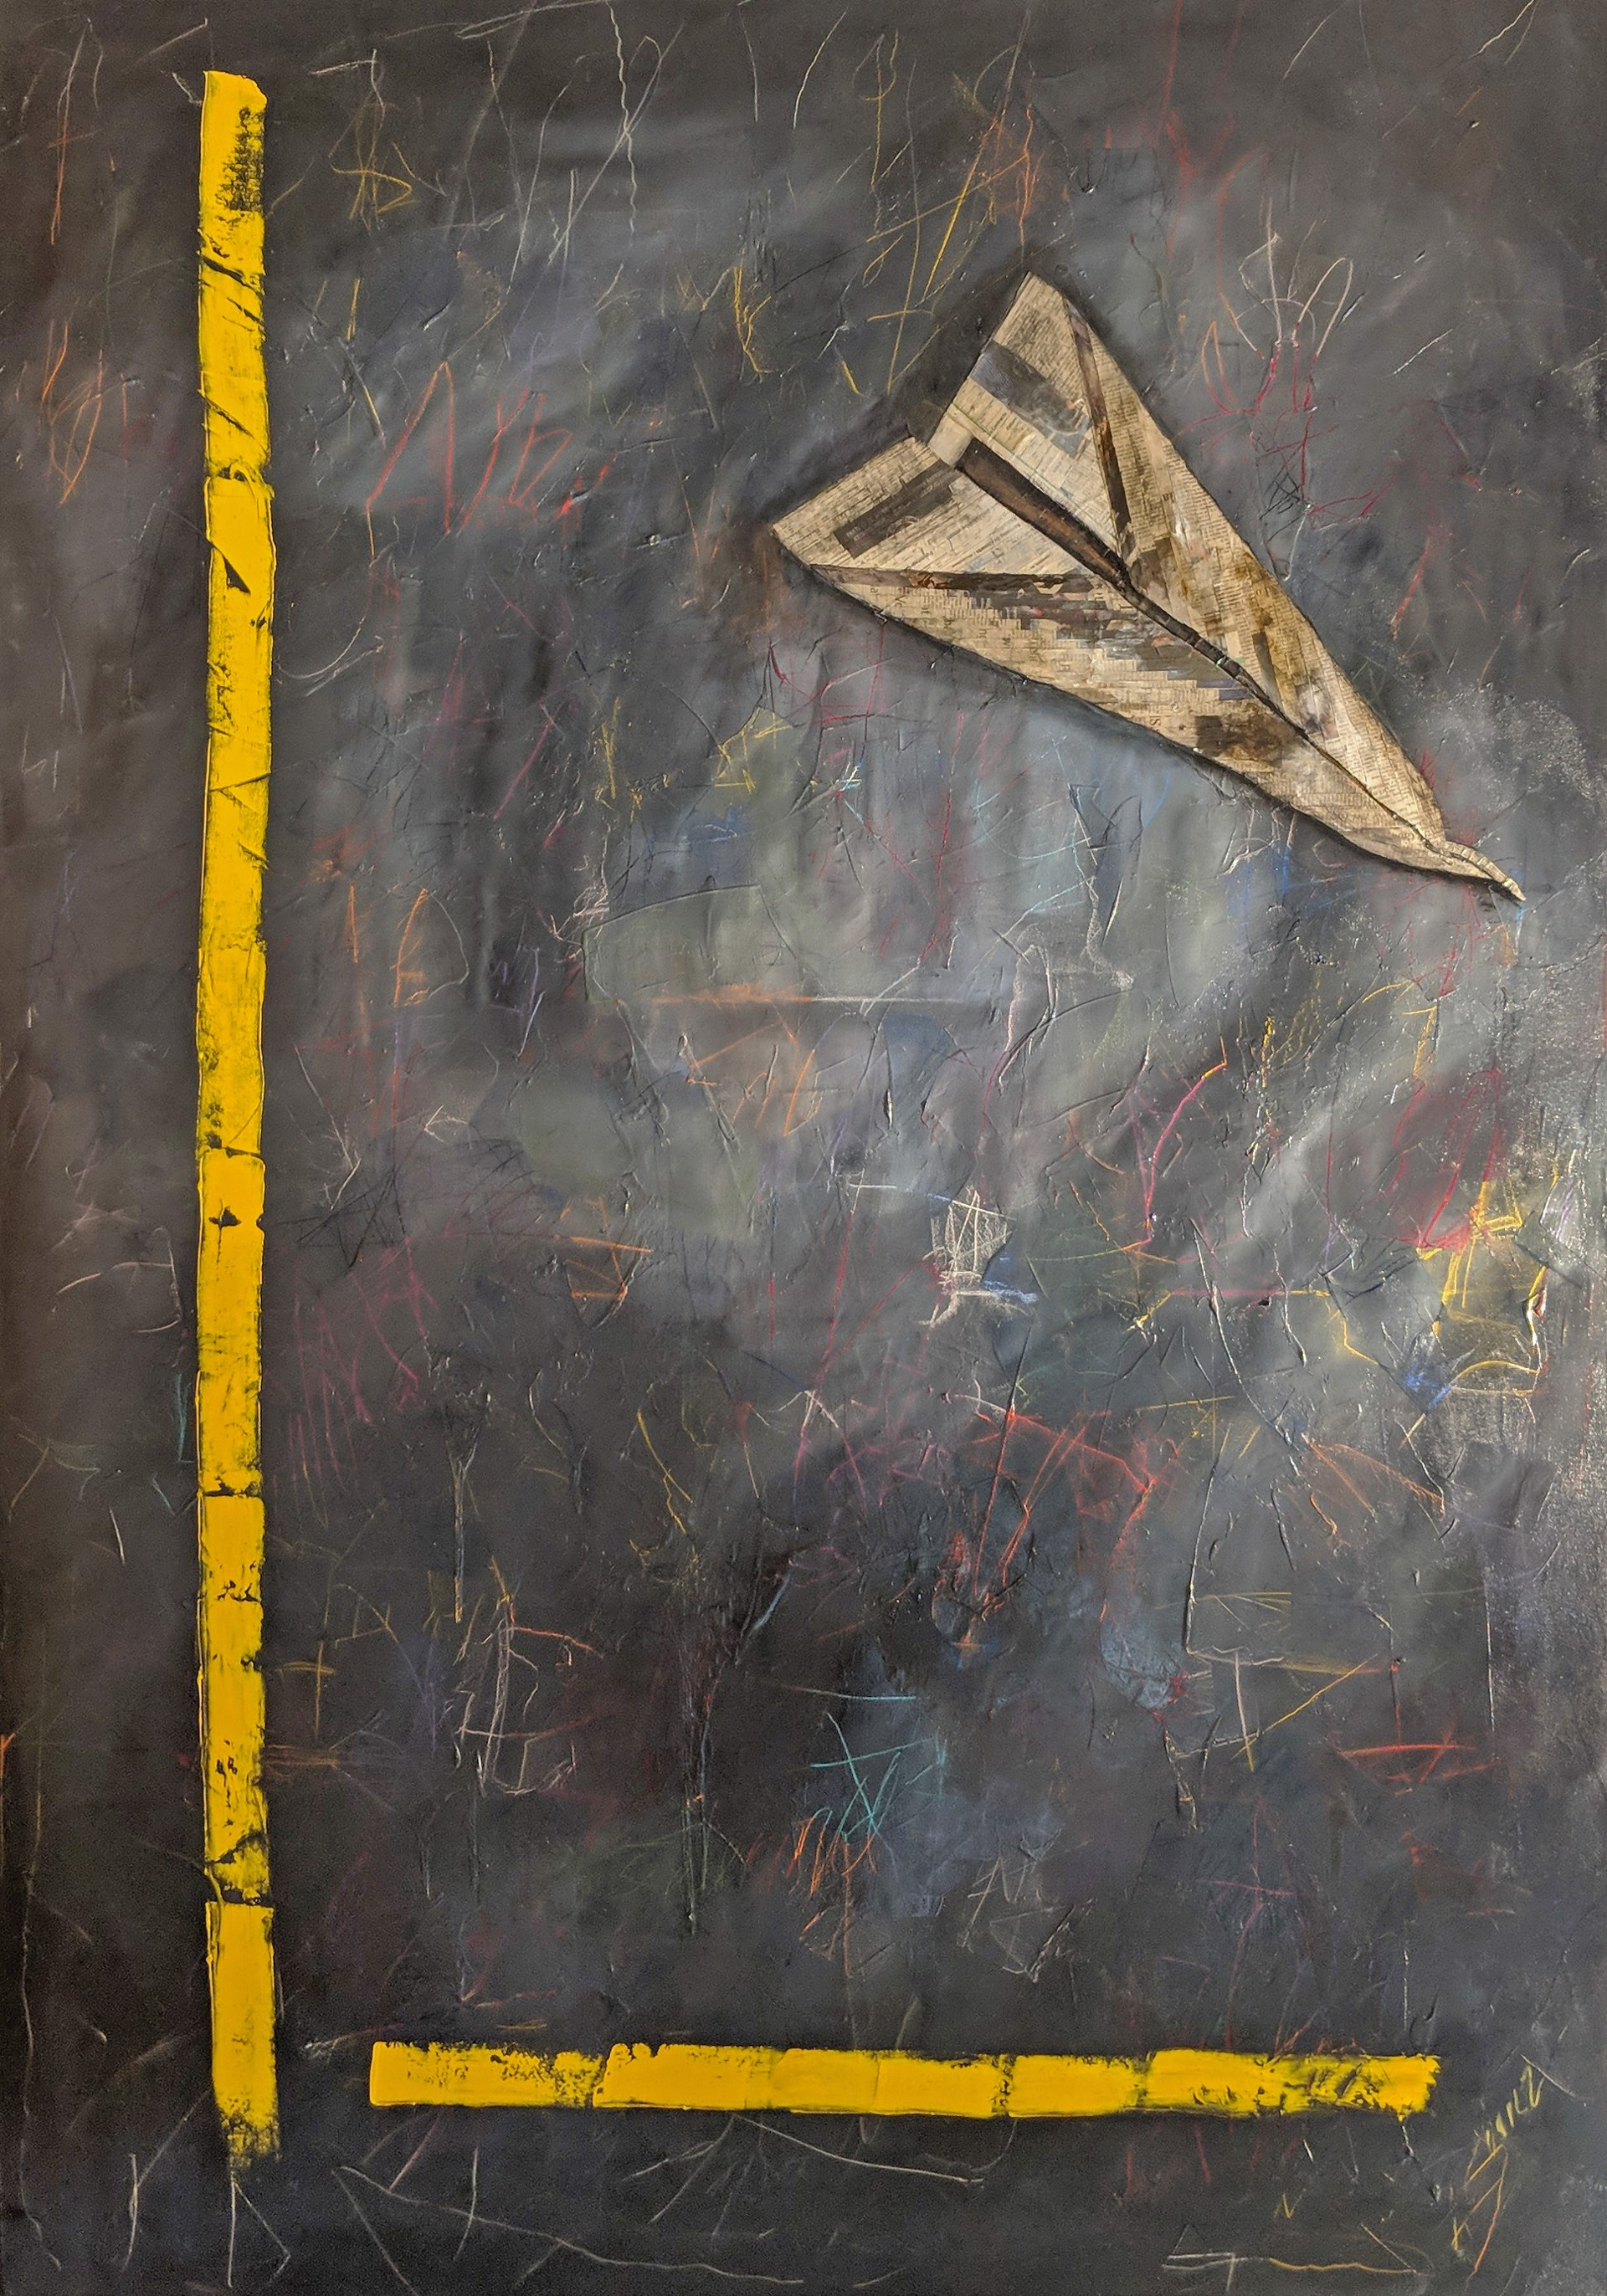 Velocity of Uncertainty by Lorena Suárez